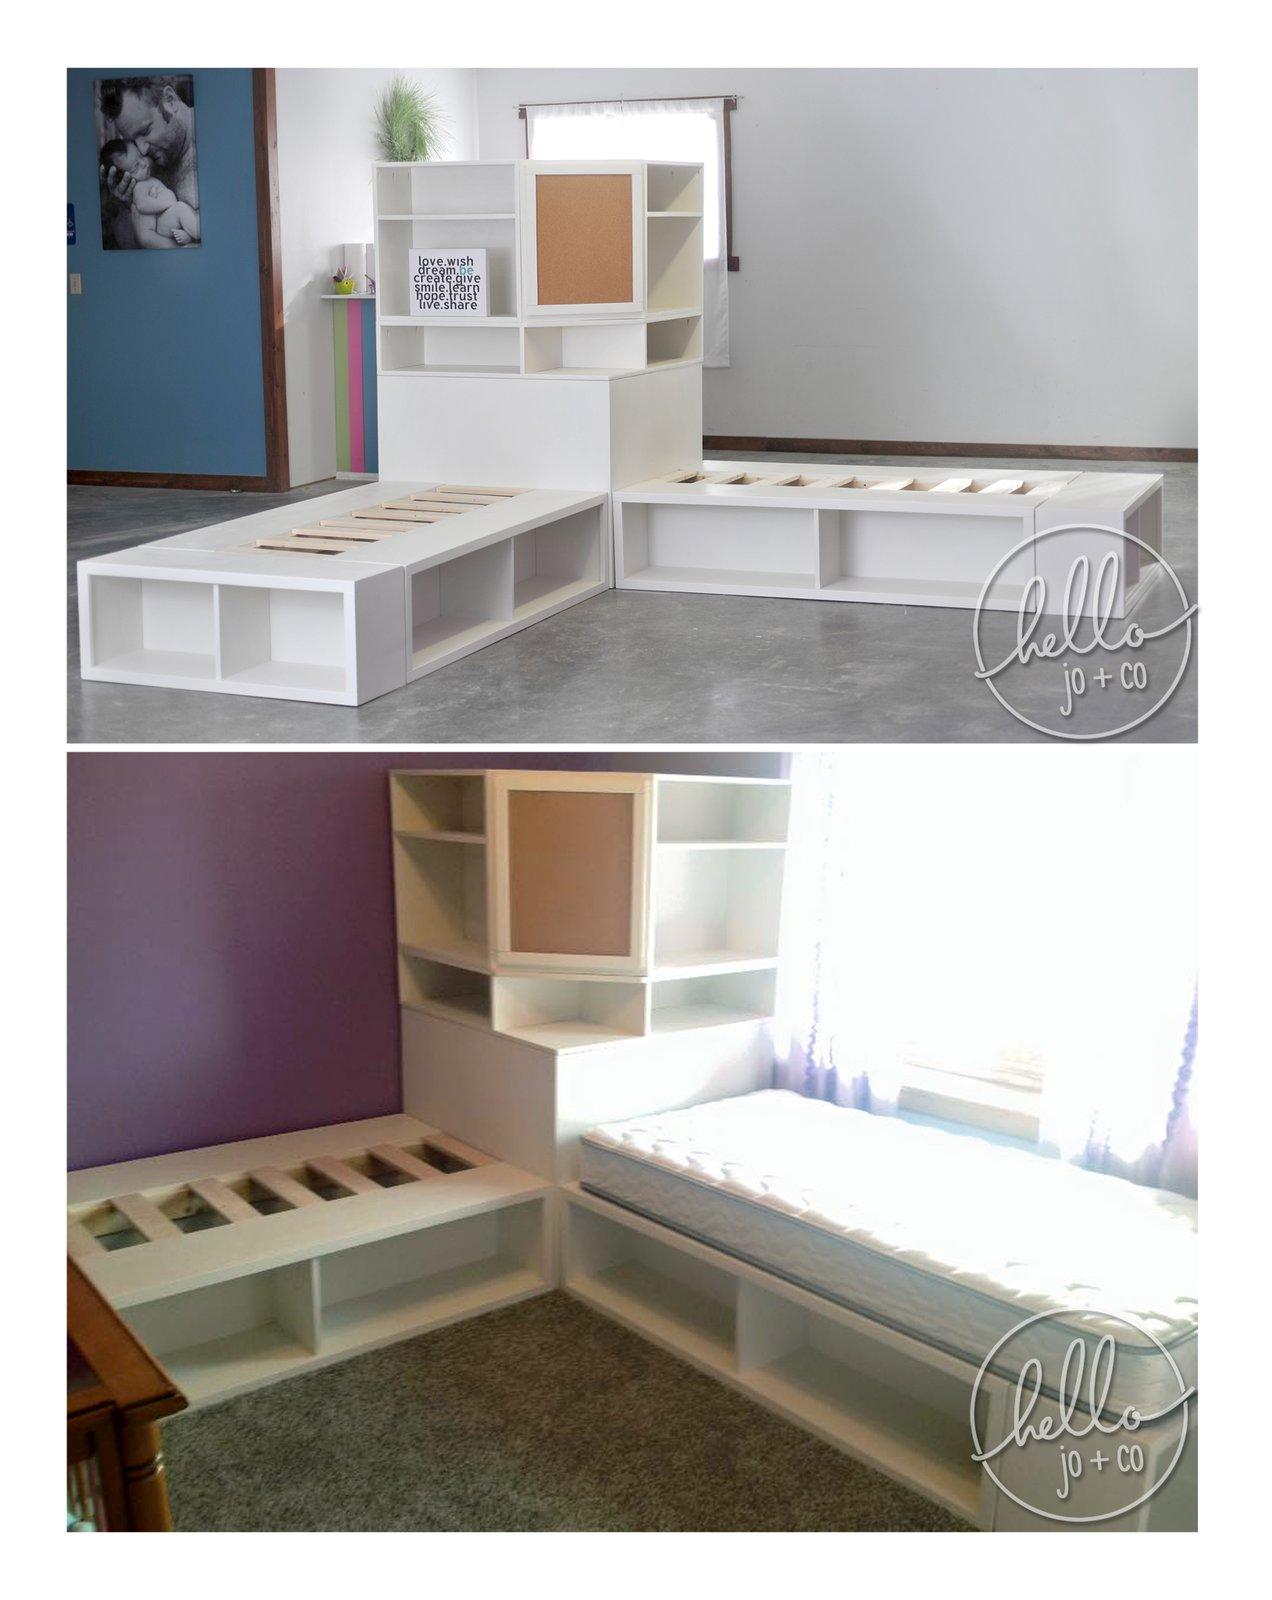 Picture of: Storage Bed With Corner Hutch Hello Jo Co